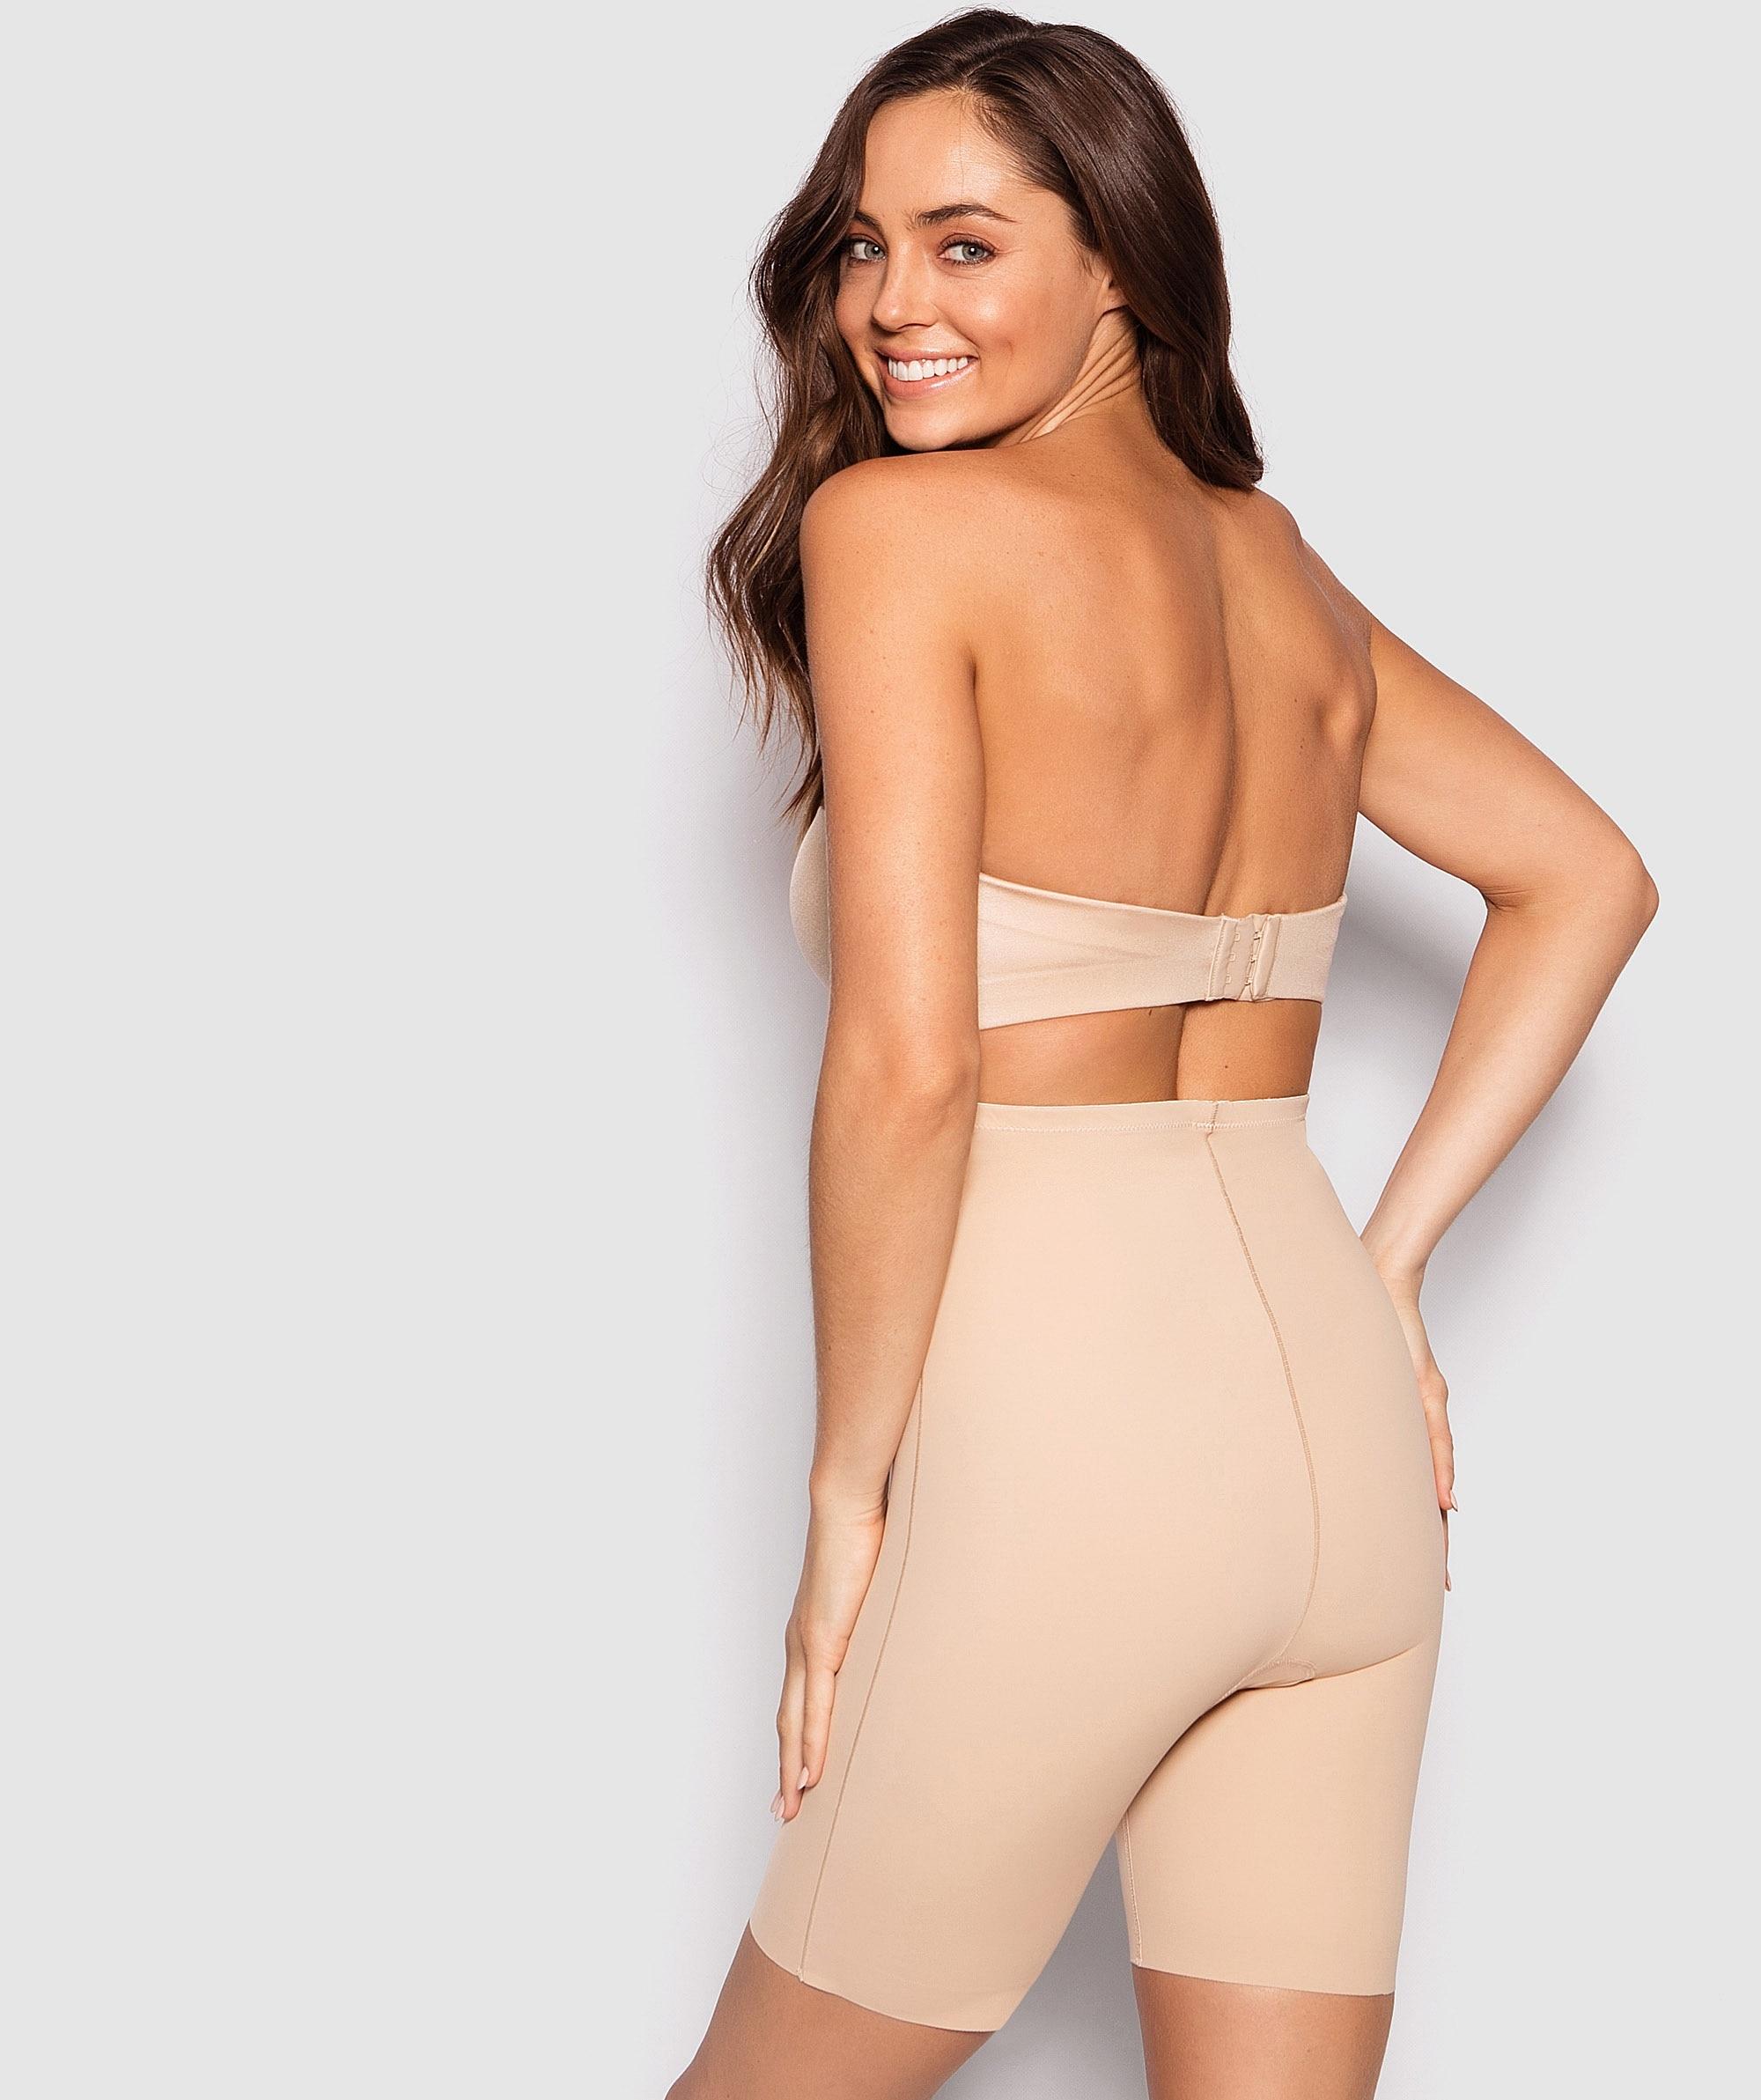 Microfibre Thigh Shaper - Nude